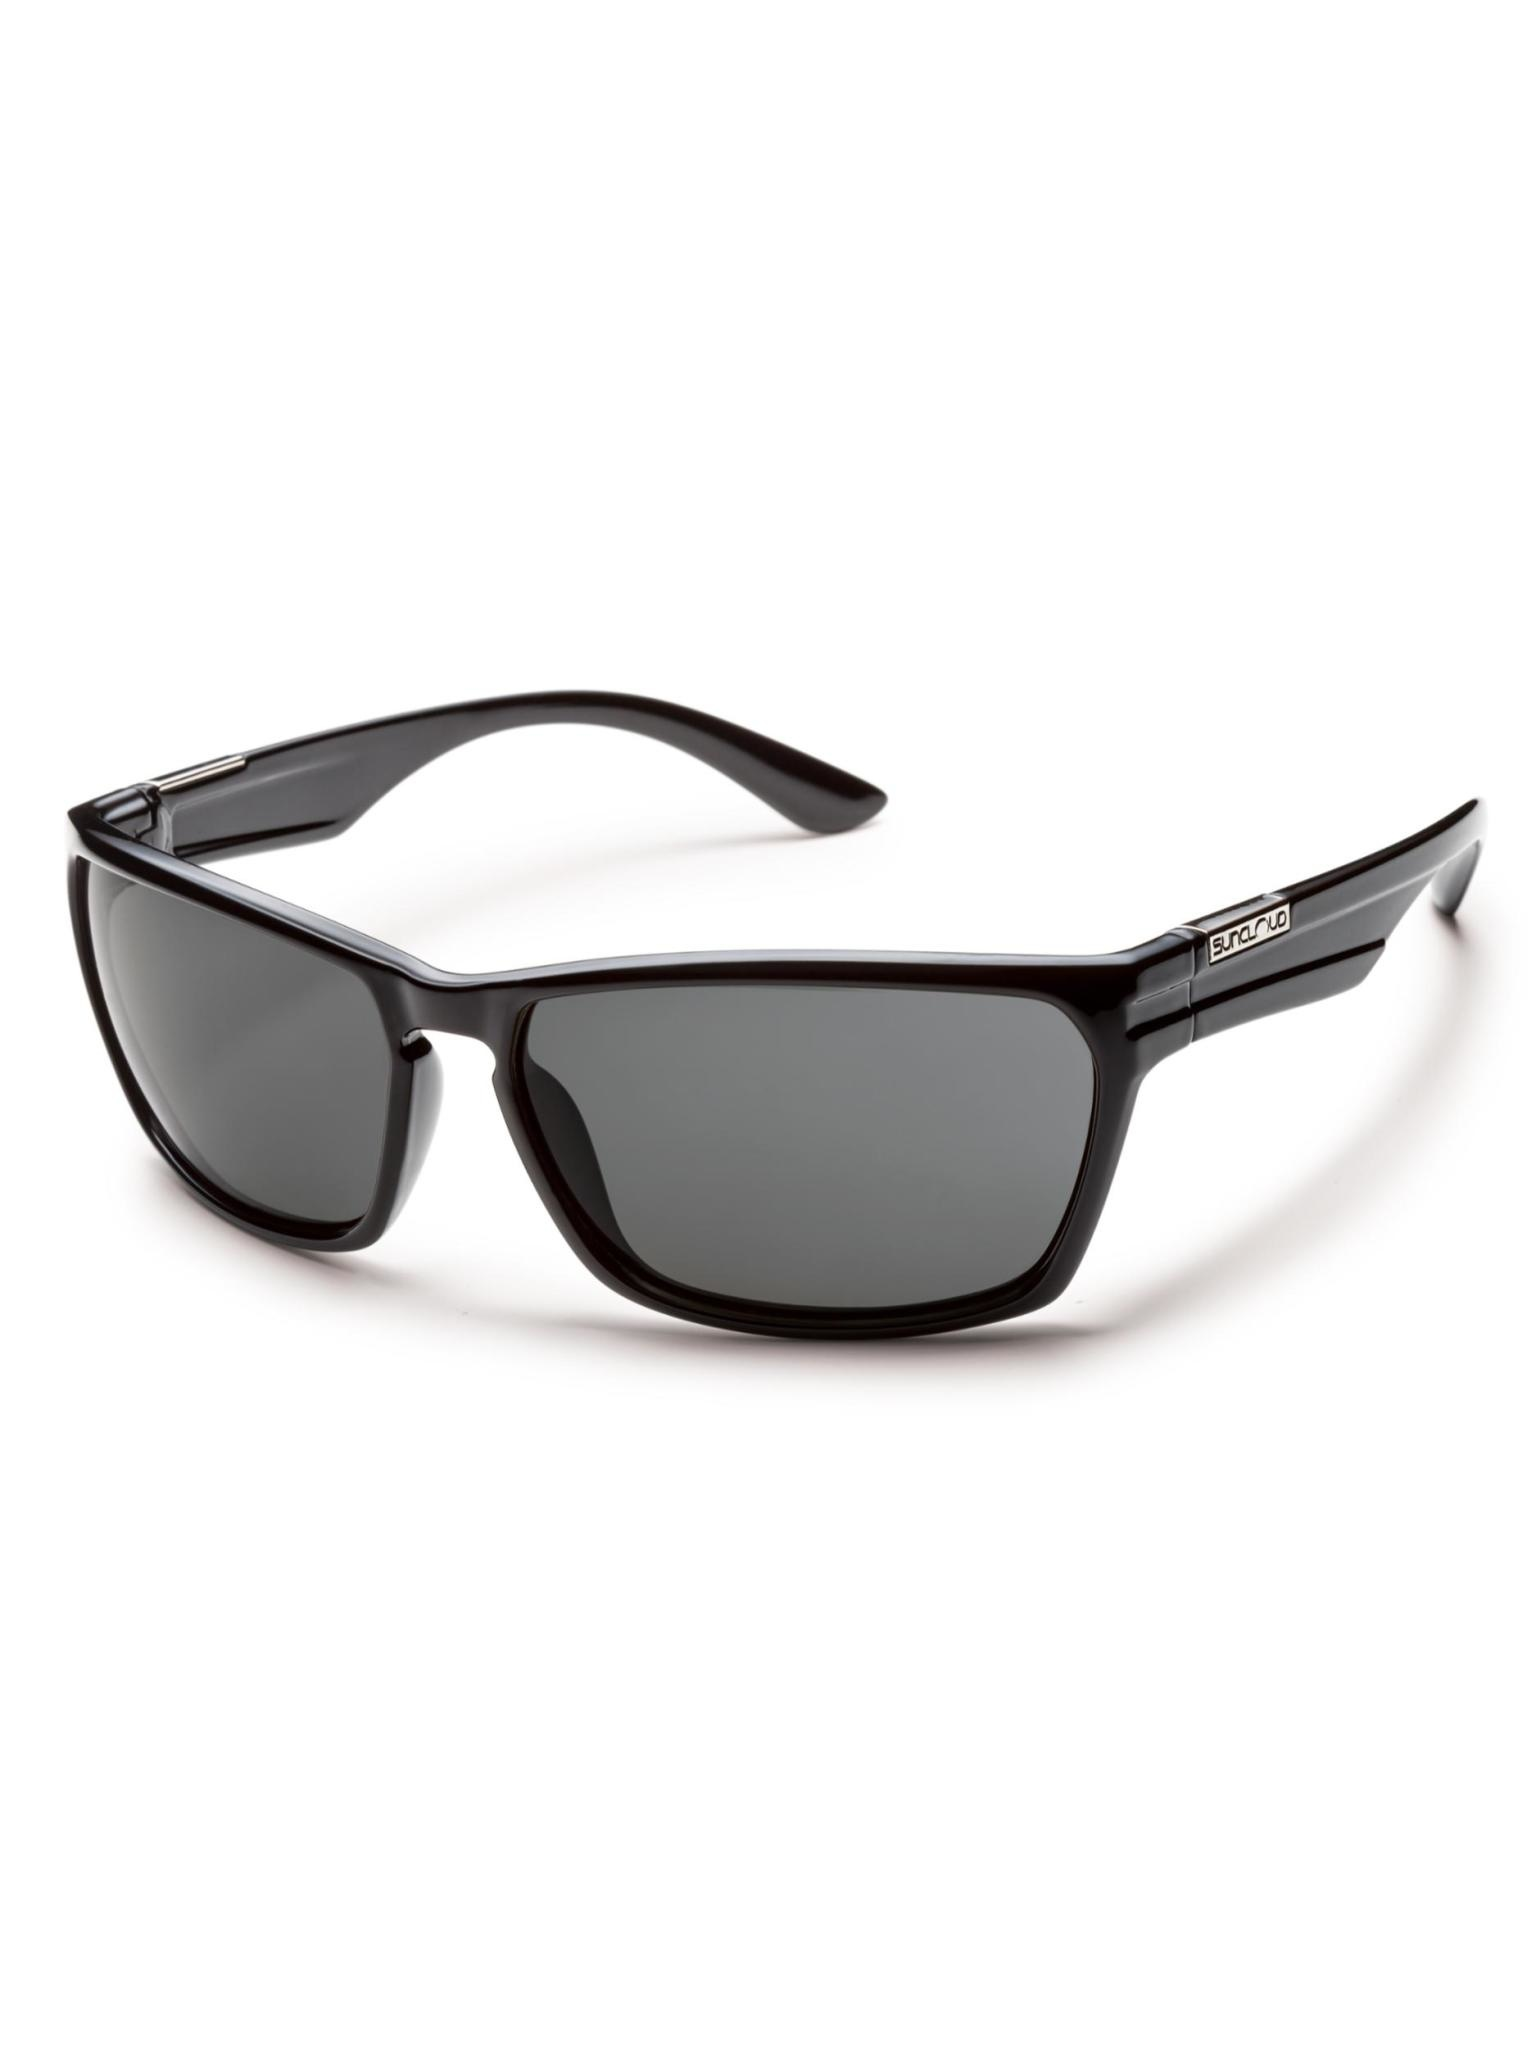 Cutout Sunglasses Black Polarized Grey